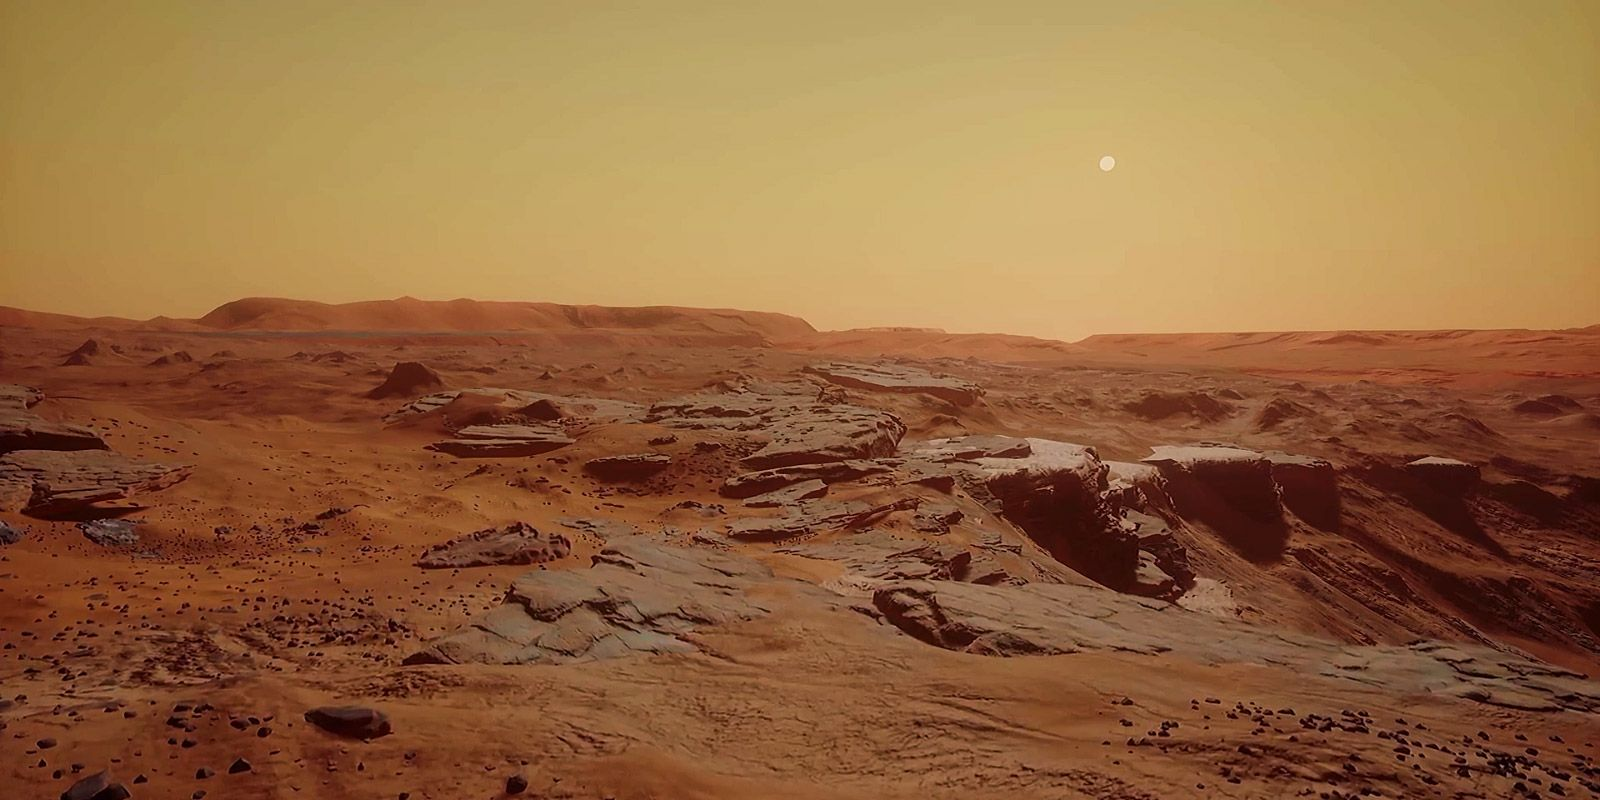 mars landscape images - HD1600×800